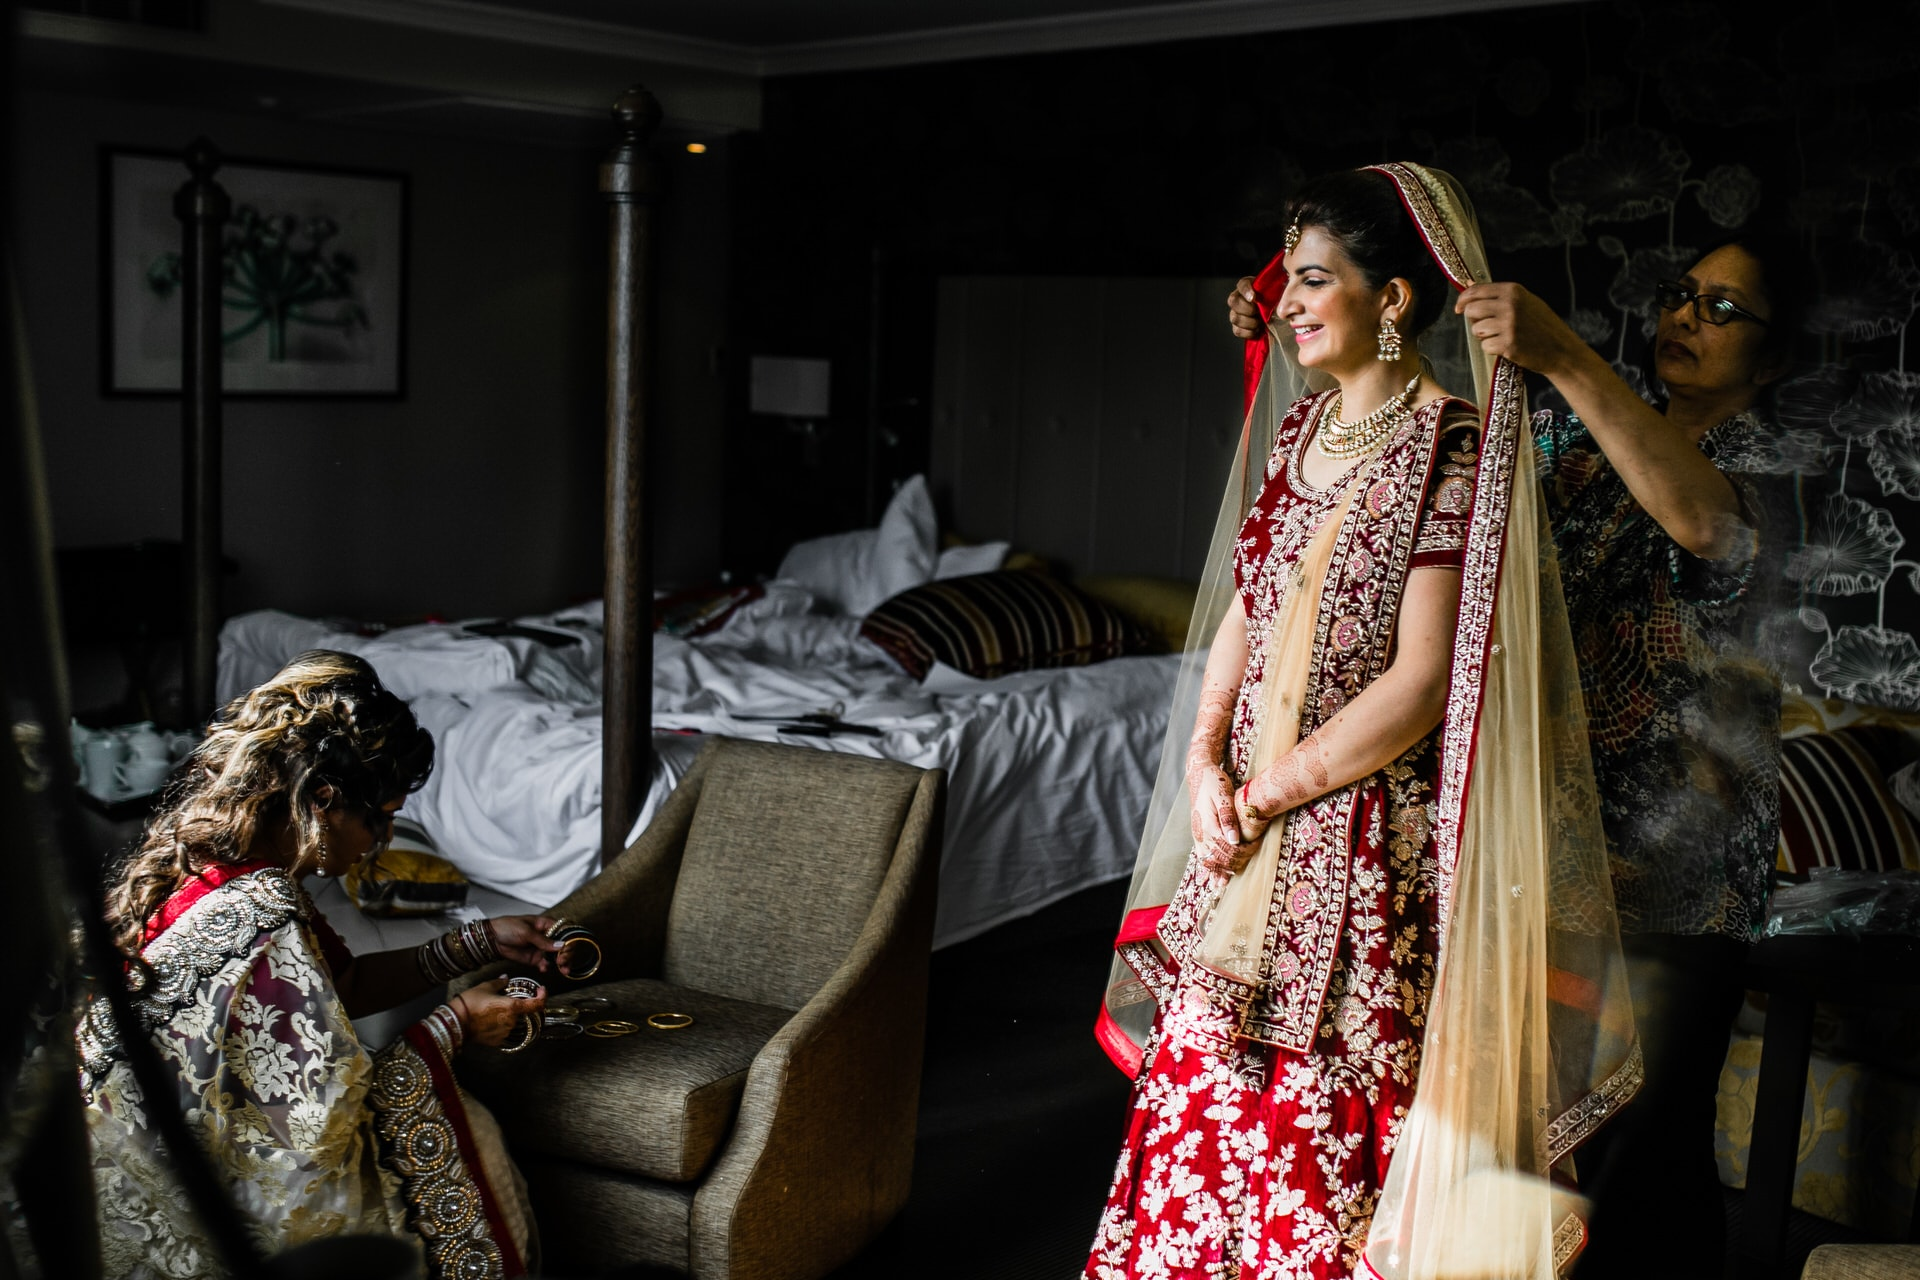 Asian bride getting ready for wedding day